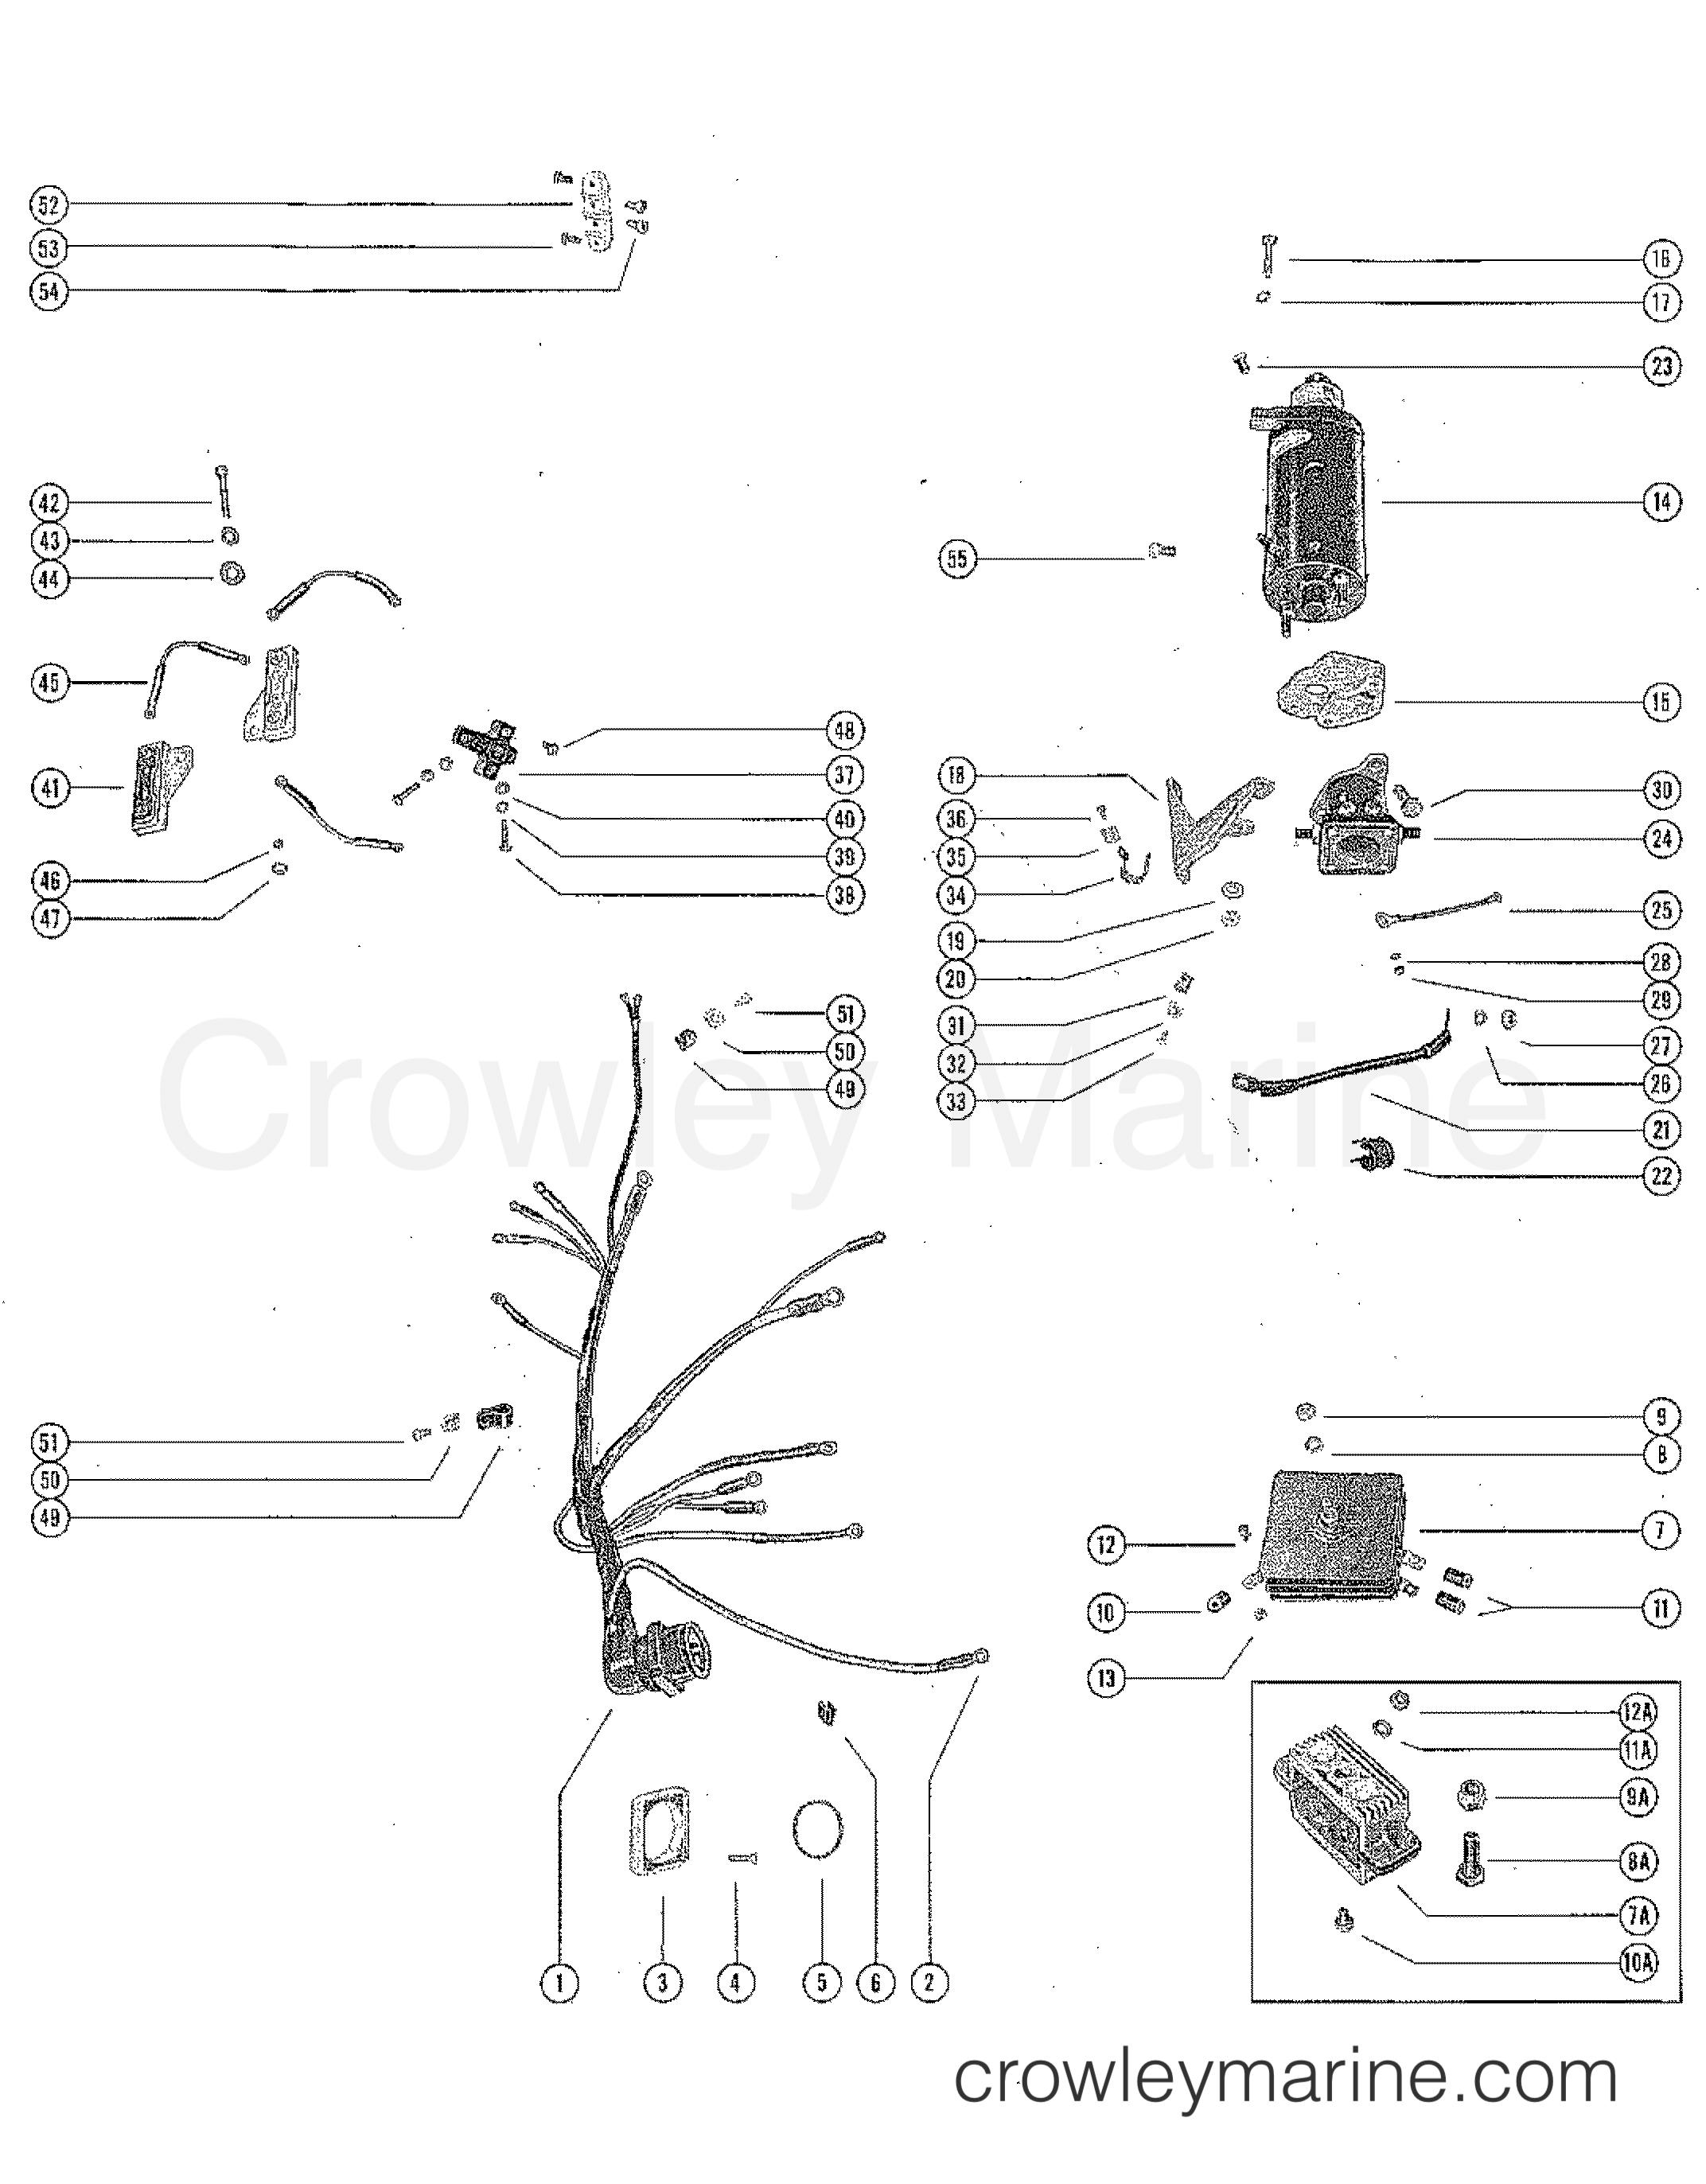 80 Hp Mercury Outboard Wiring Diagram